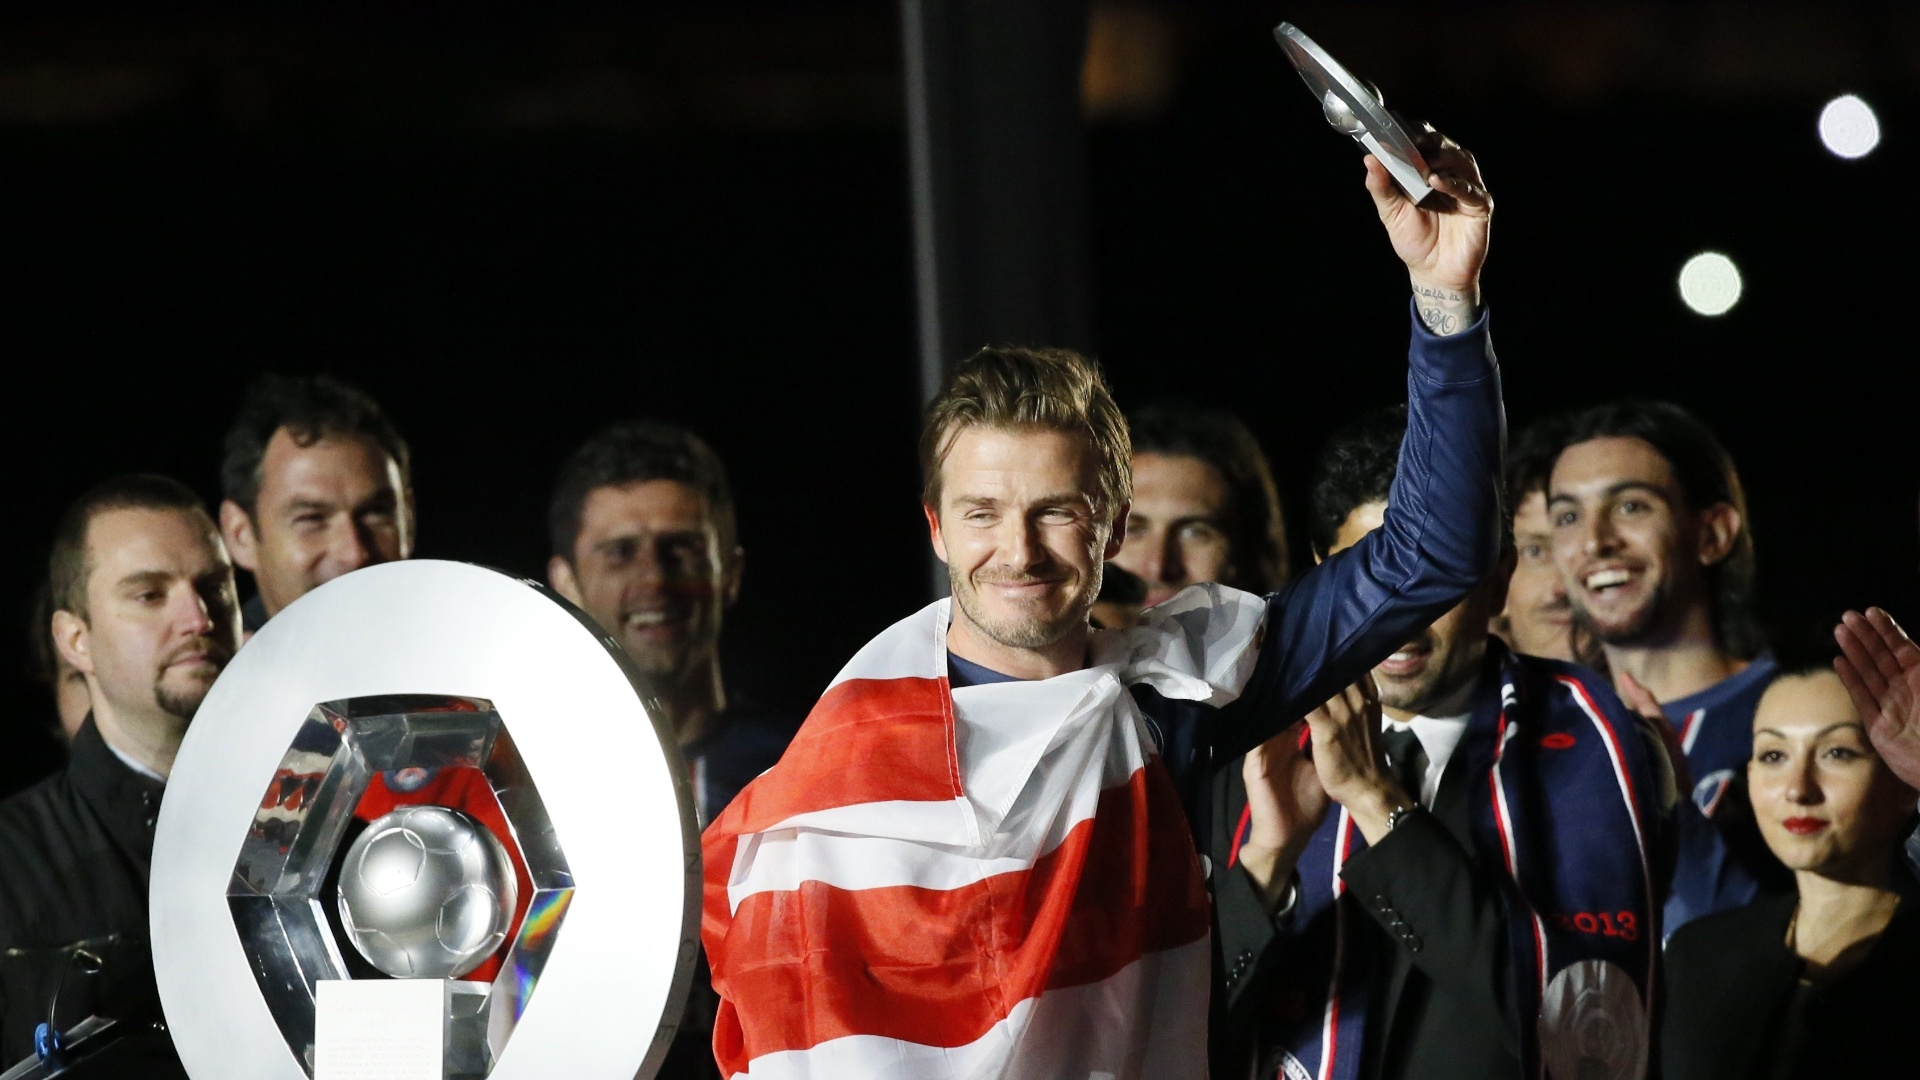 18.mai.2013 - David Beckham, do Paris Saint-Germain, agradece aos aplausos dos torcedores durante a festa do título do PSG